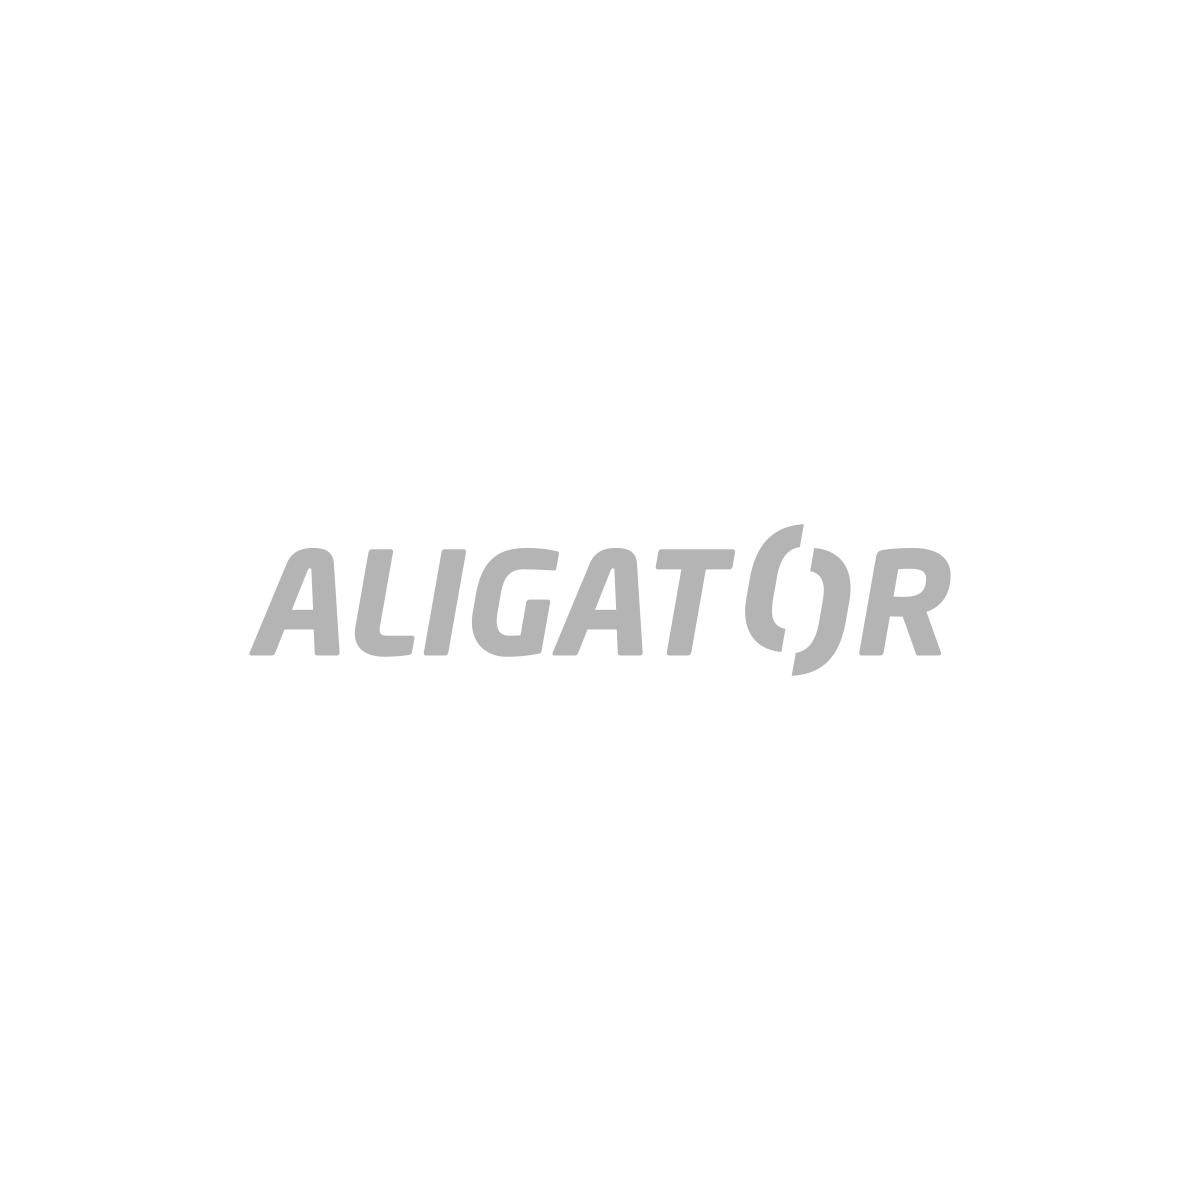 [klienti/Aligator.png]